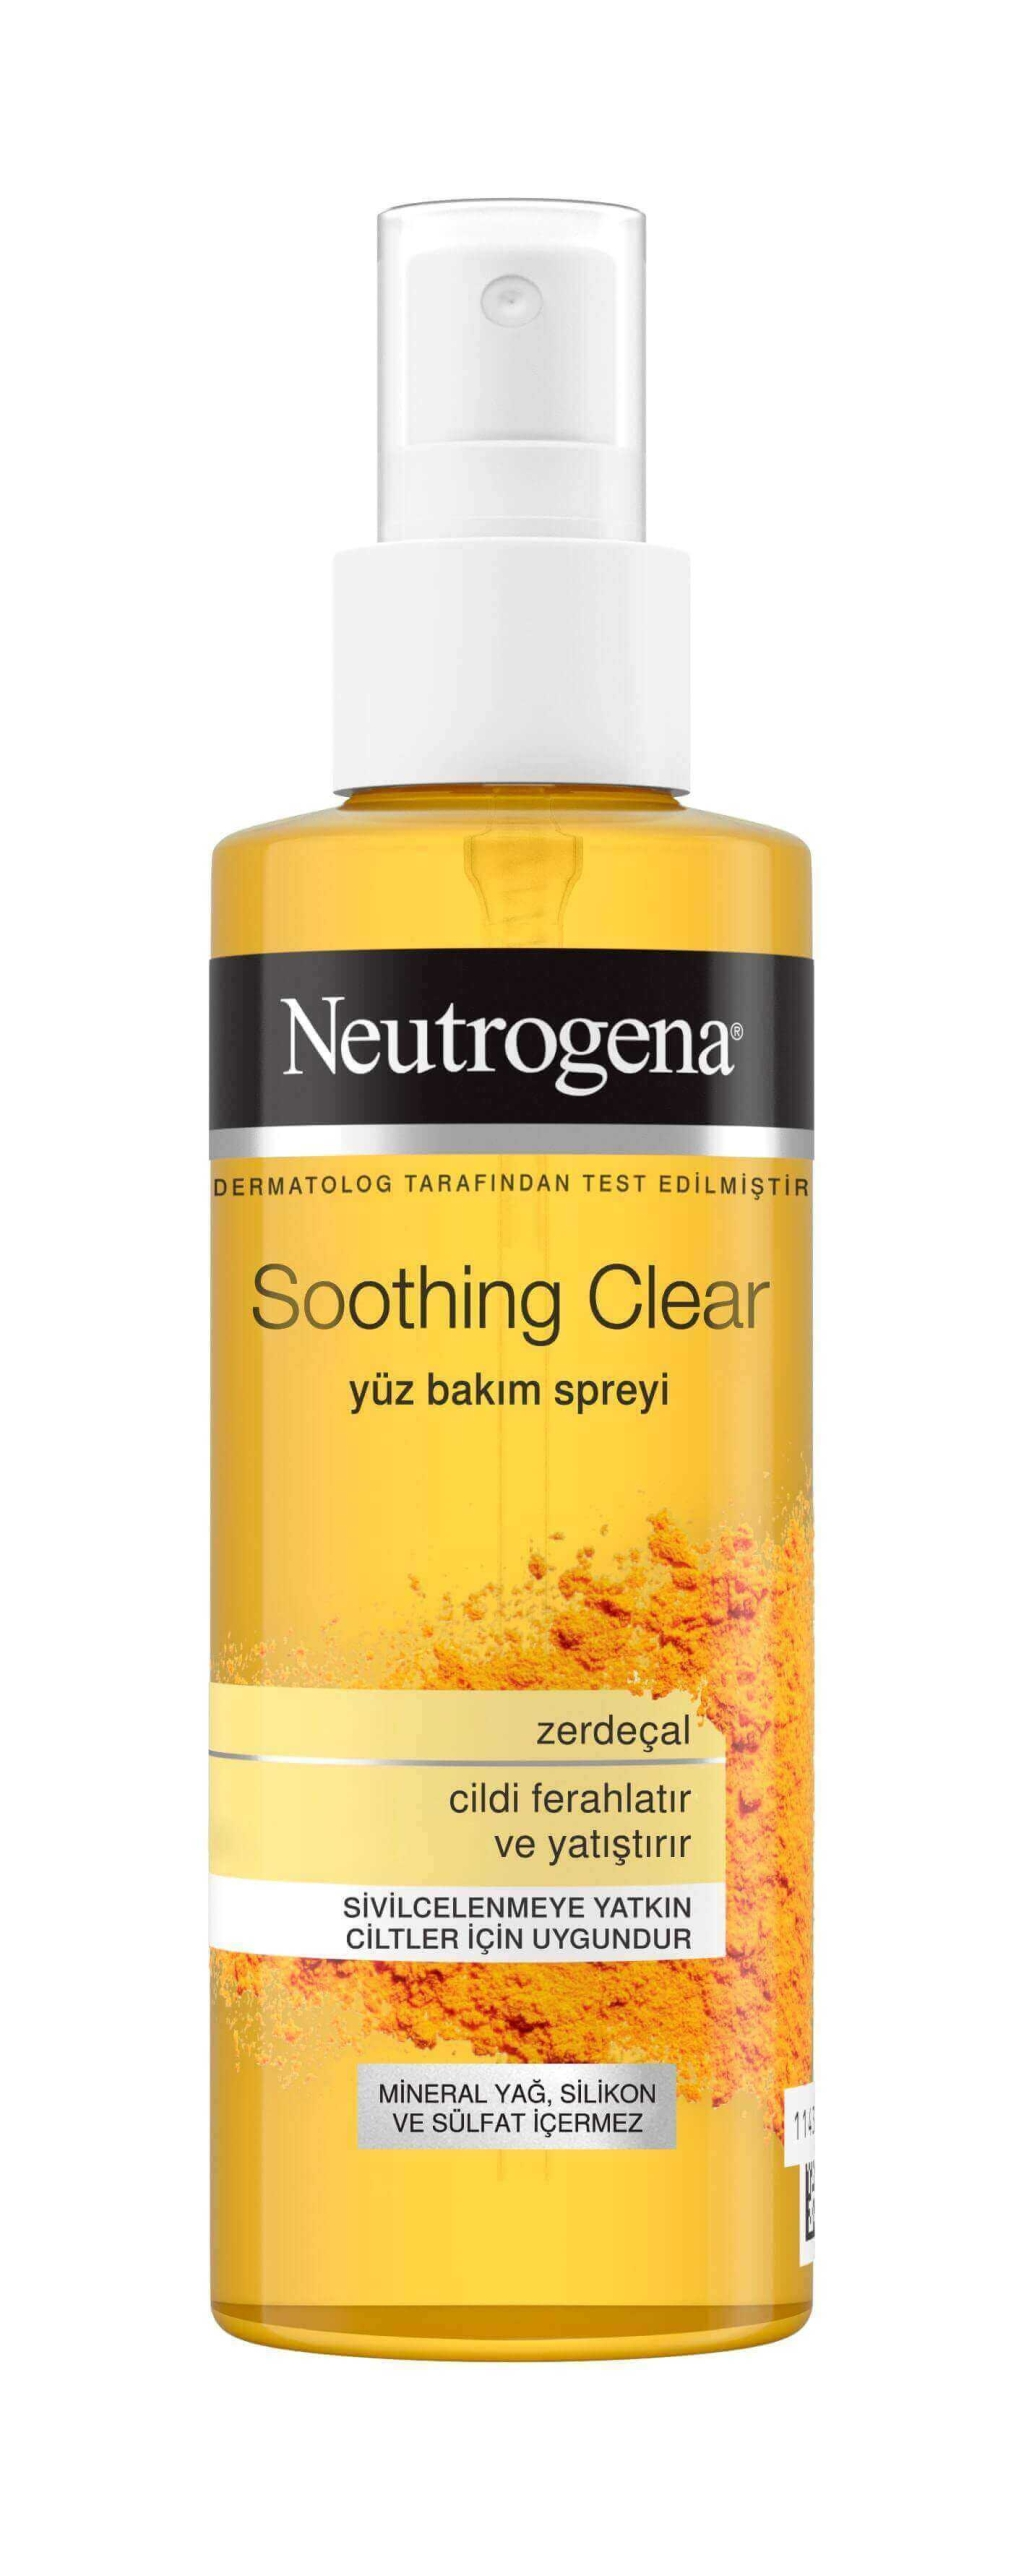 Neutrogena Soothing Clear Nemlendirici Tonik Sprey